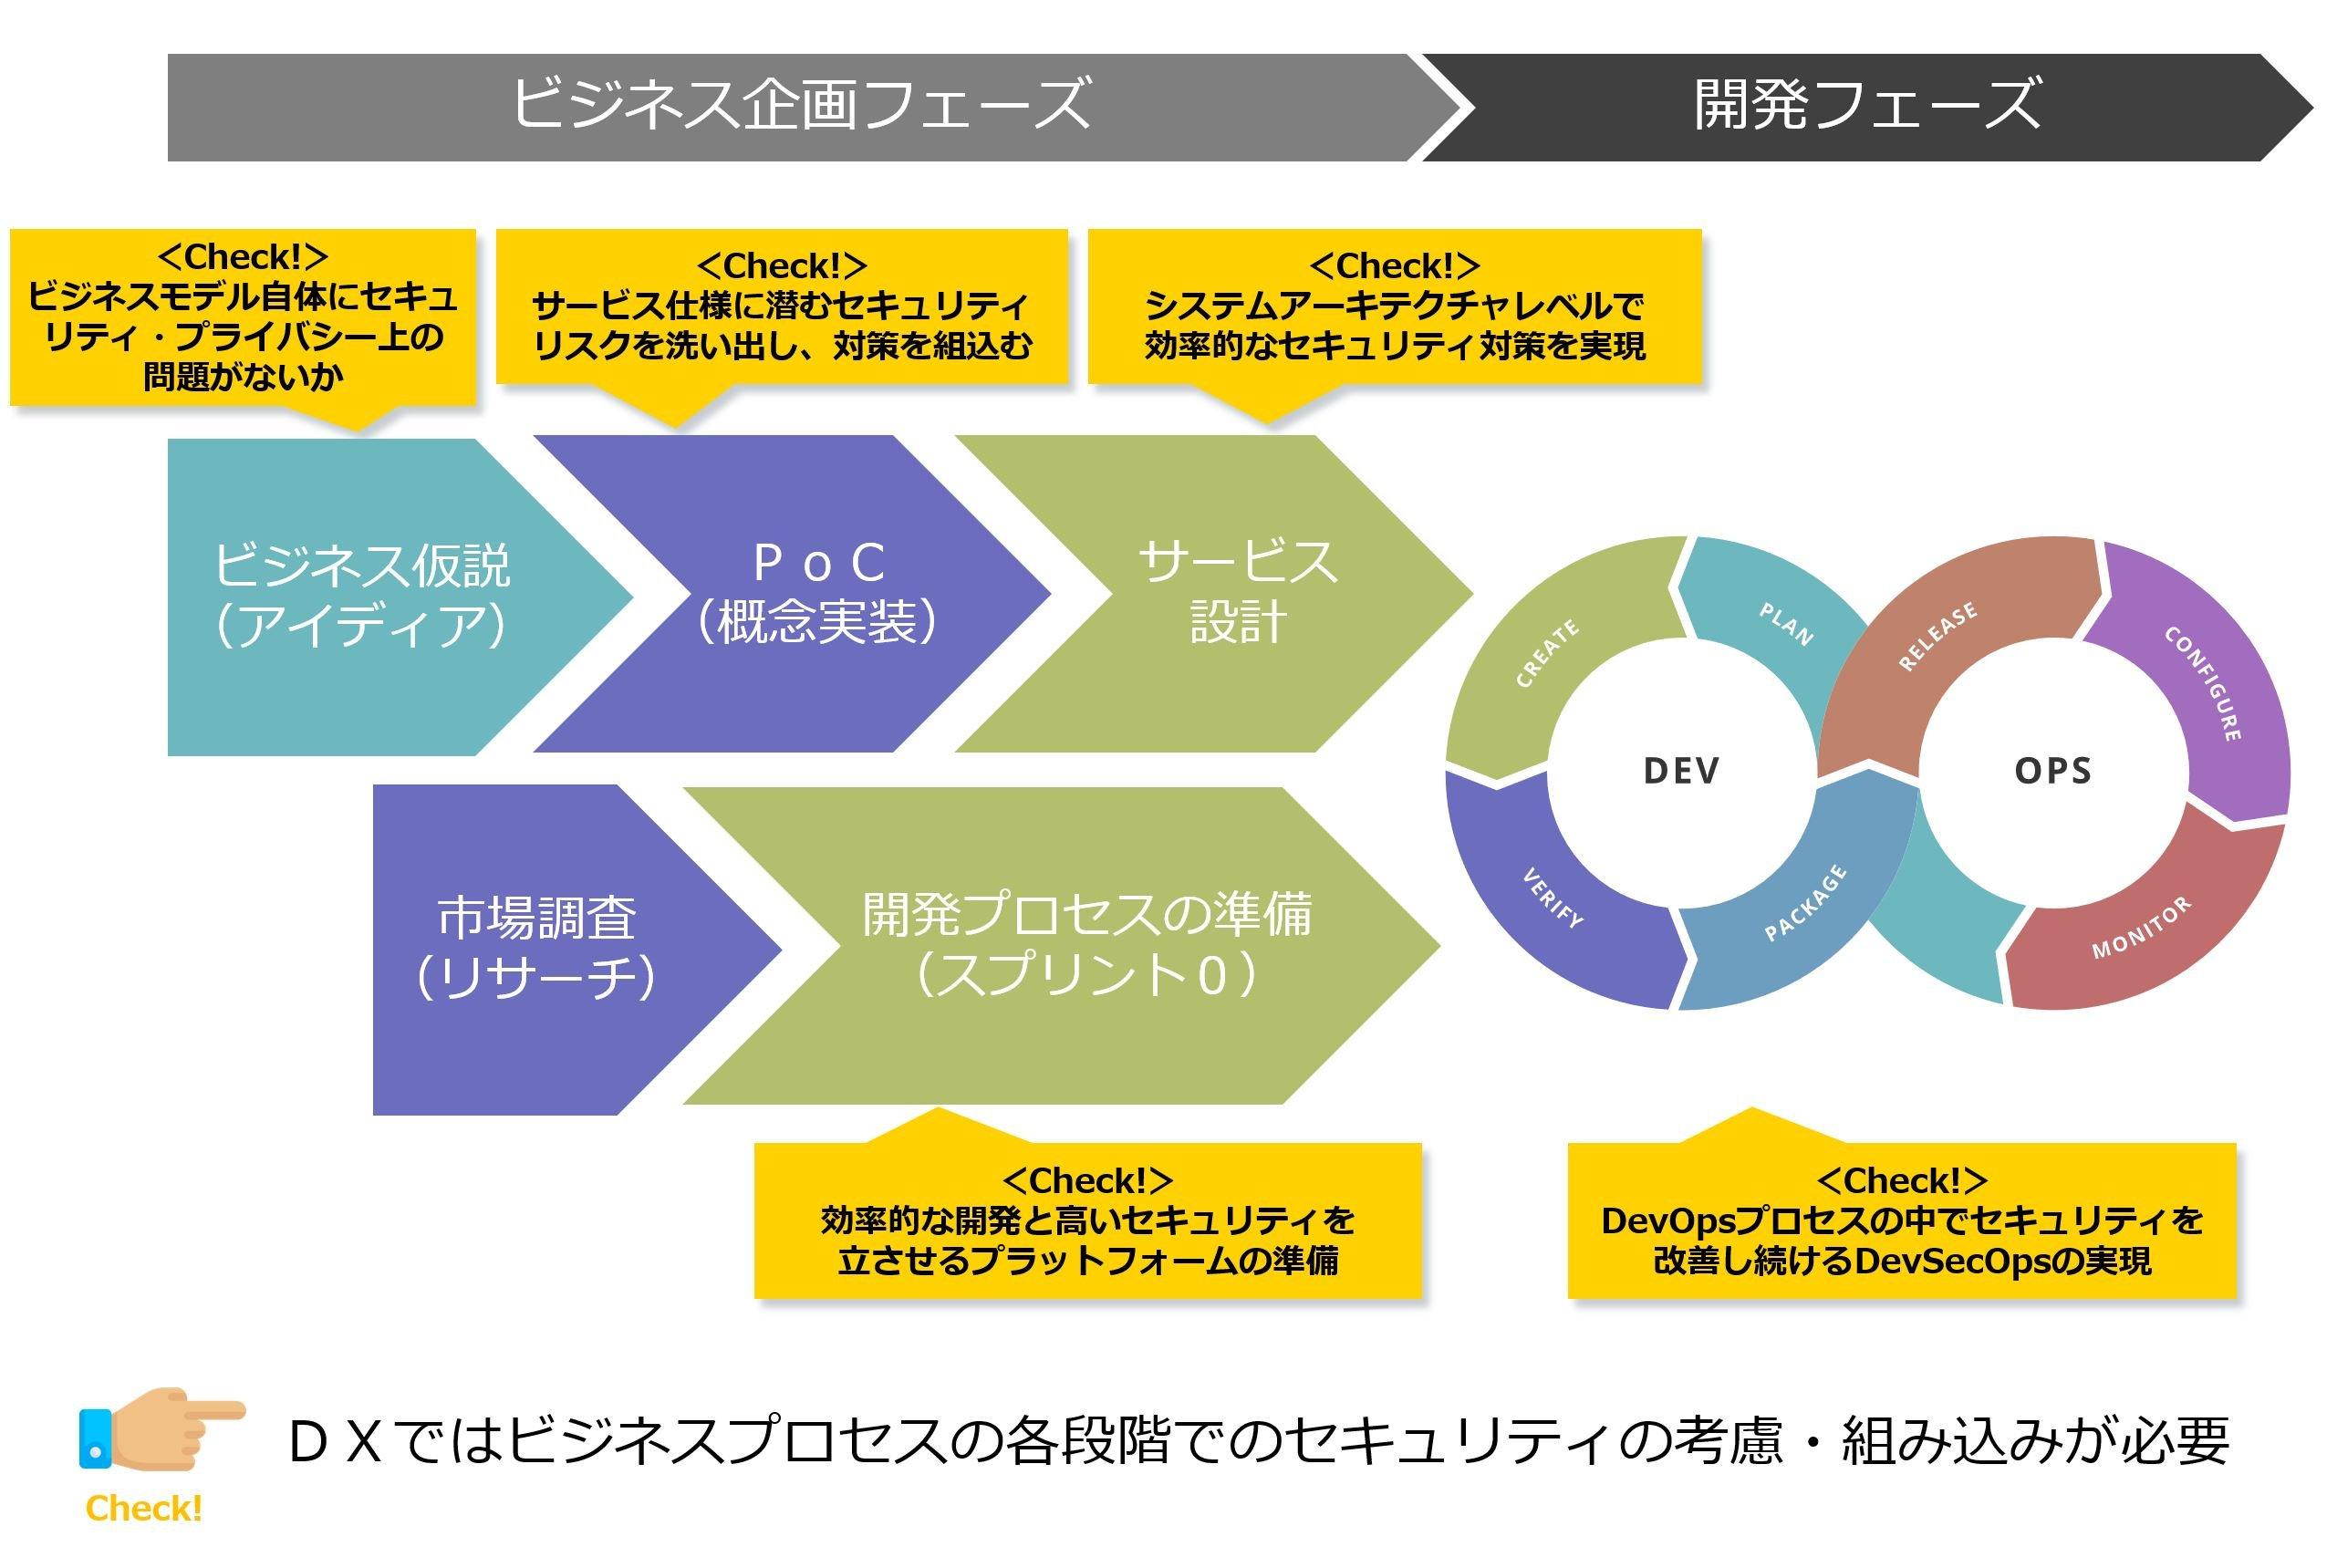 DX_Process_Security